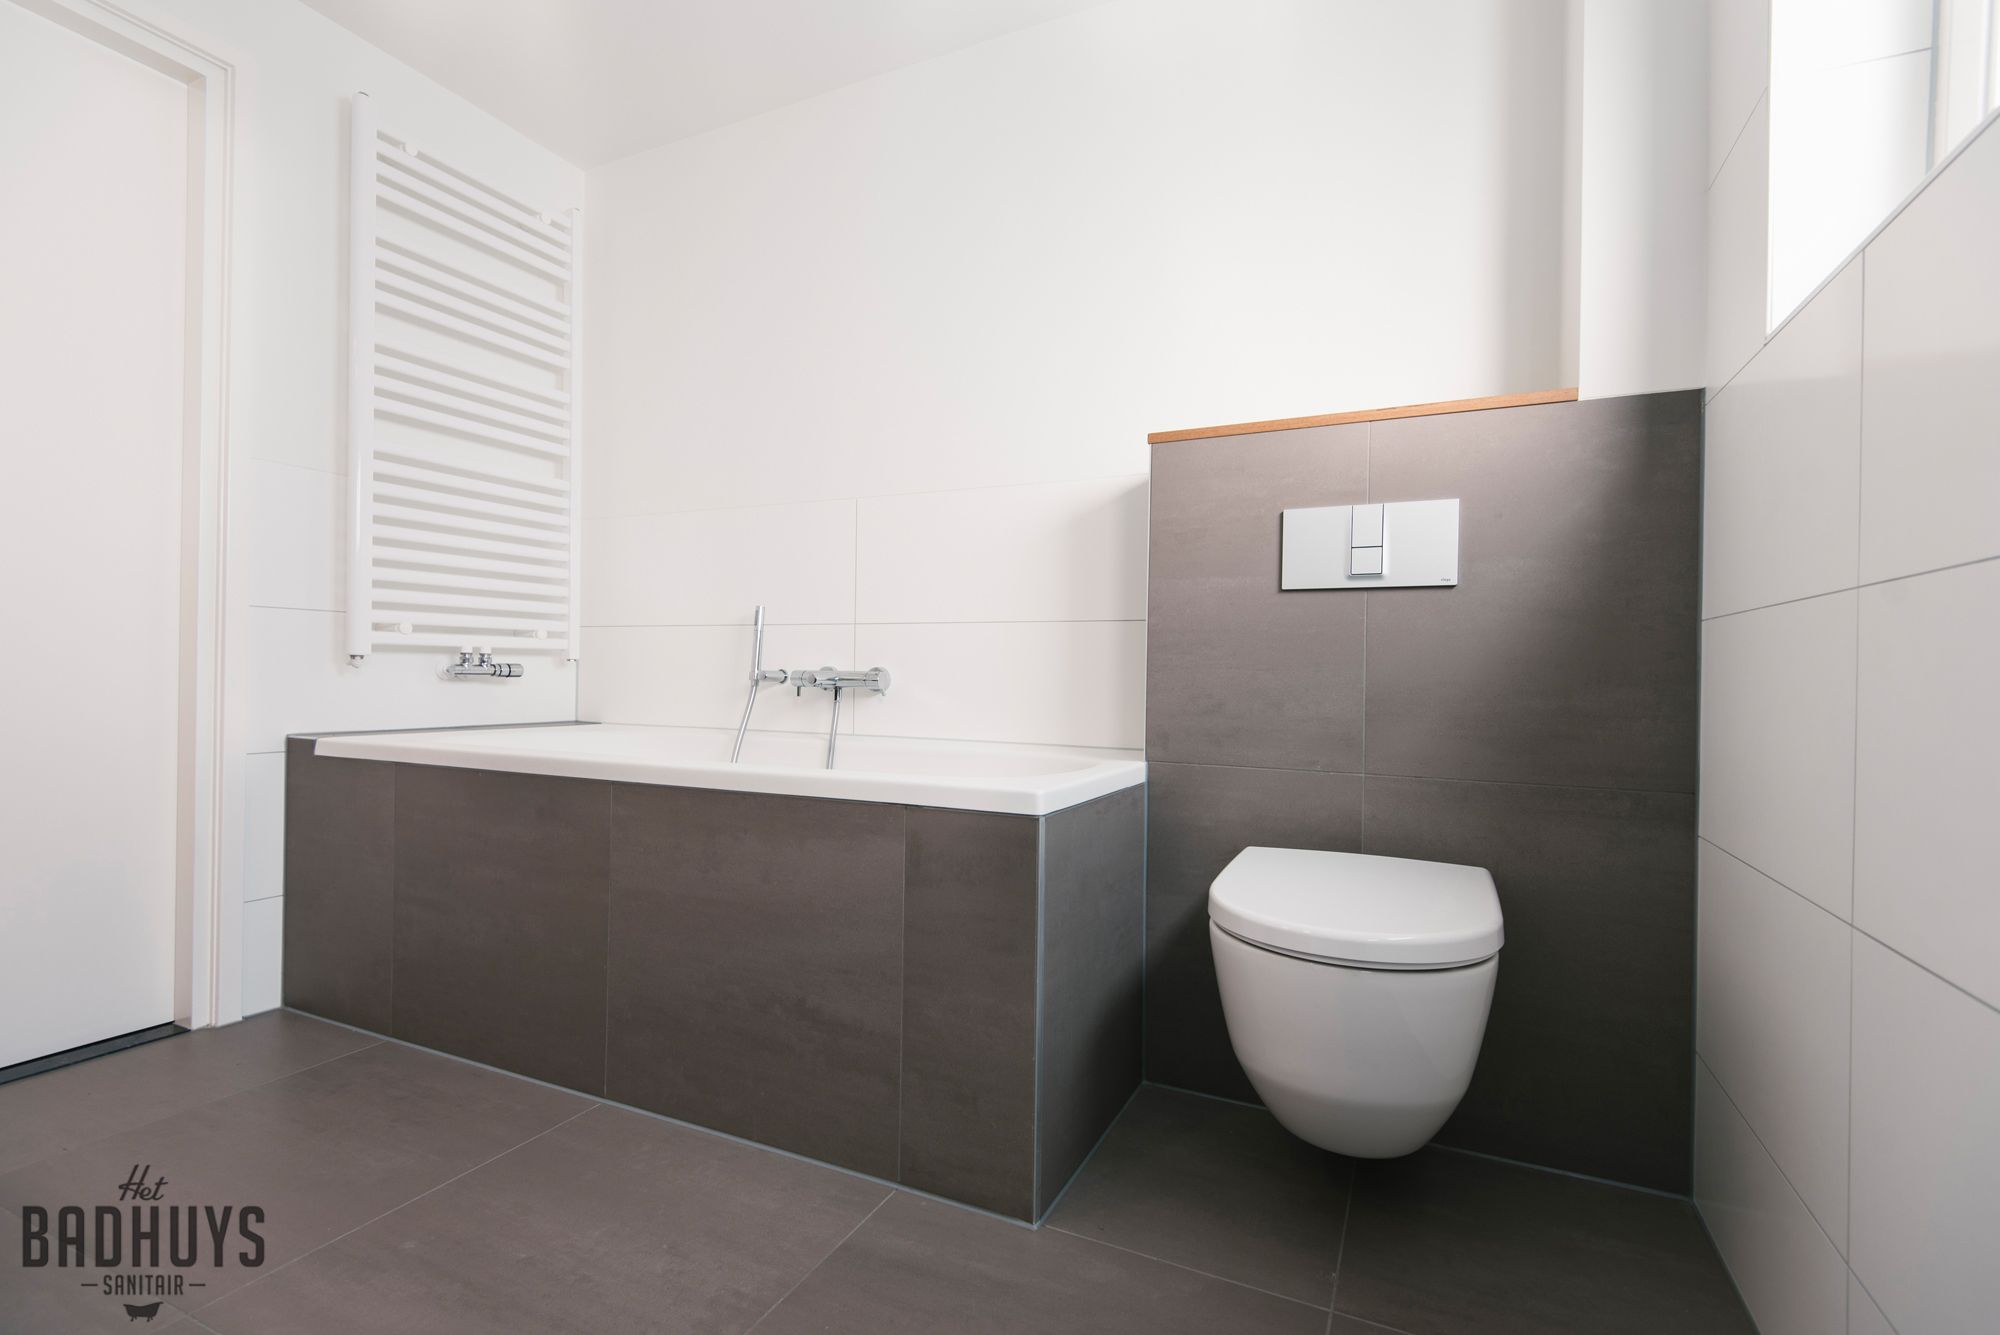 Inrichting Badkamer Vloer : Het badhuys breda architectuur pinterest bathroom bathroom